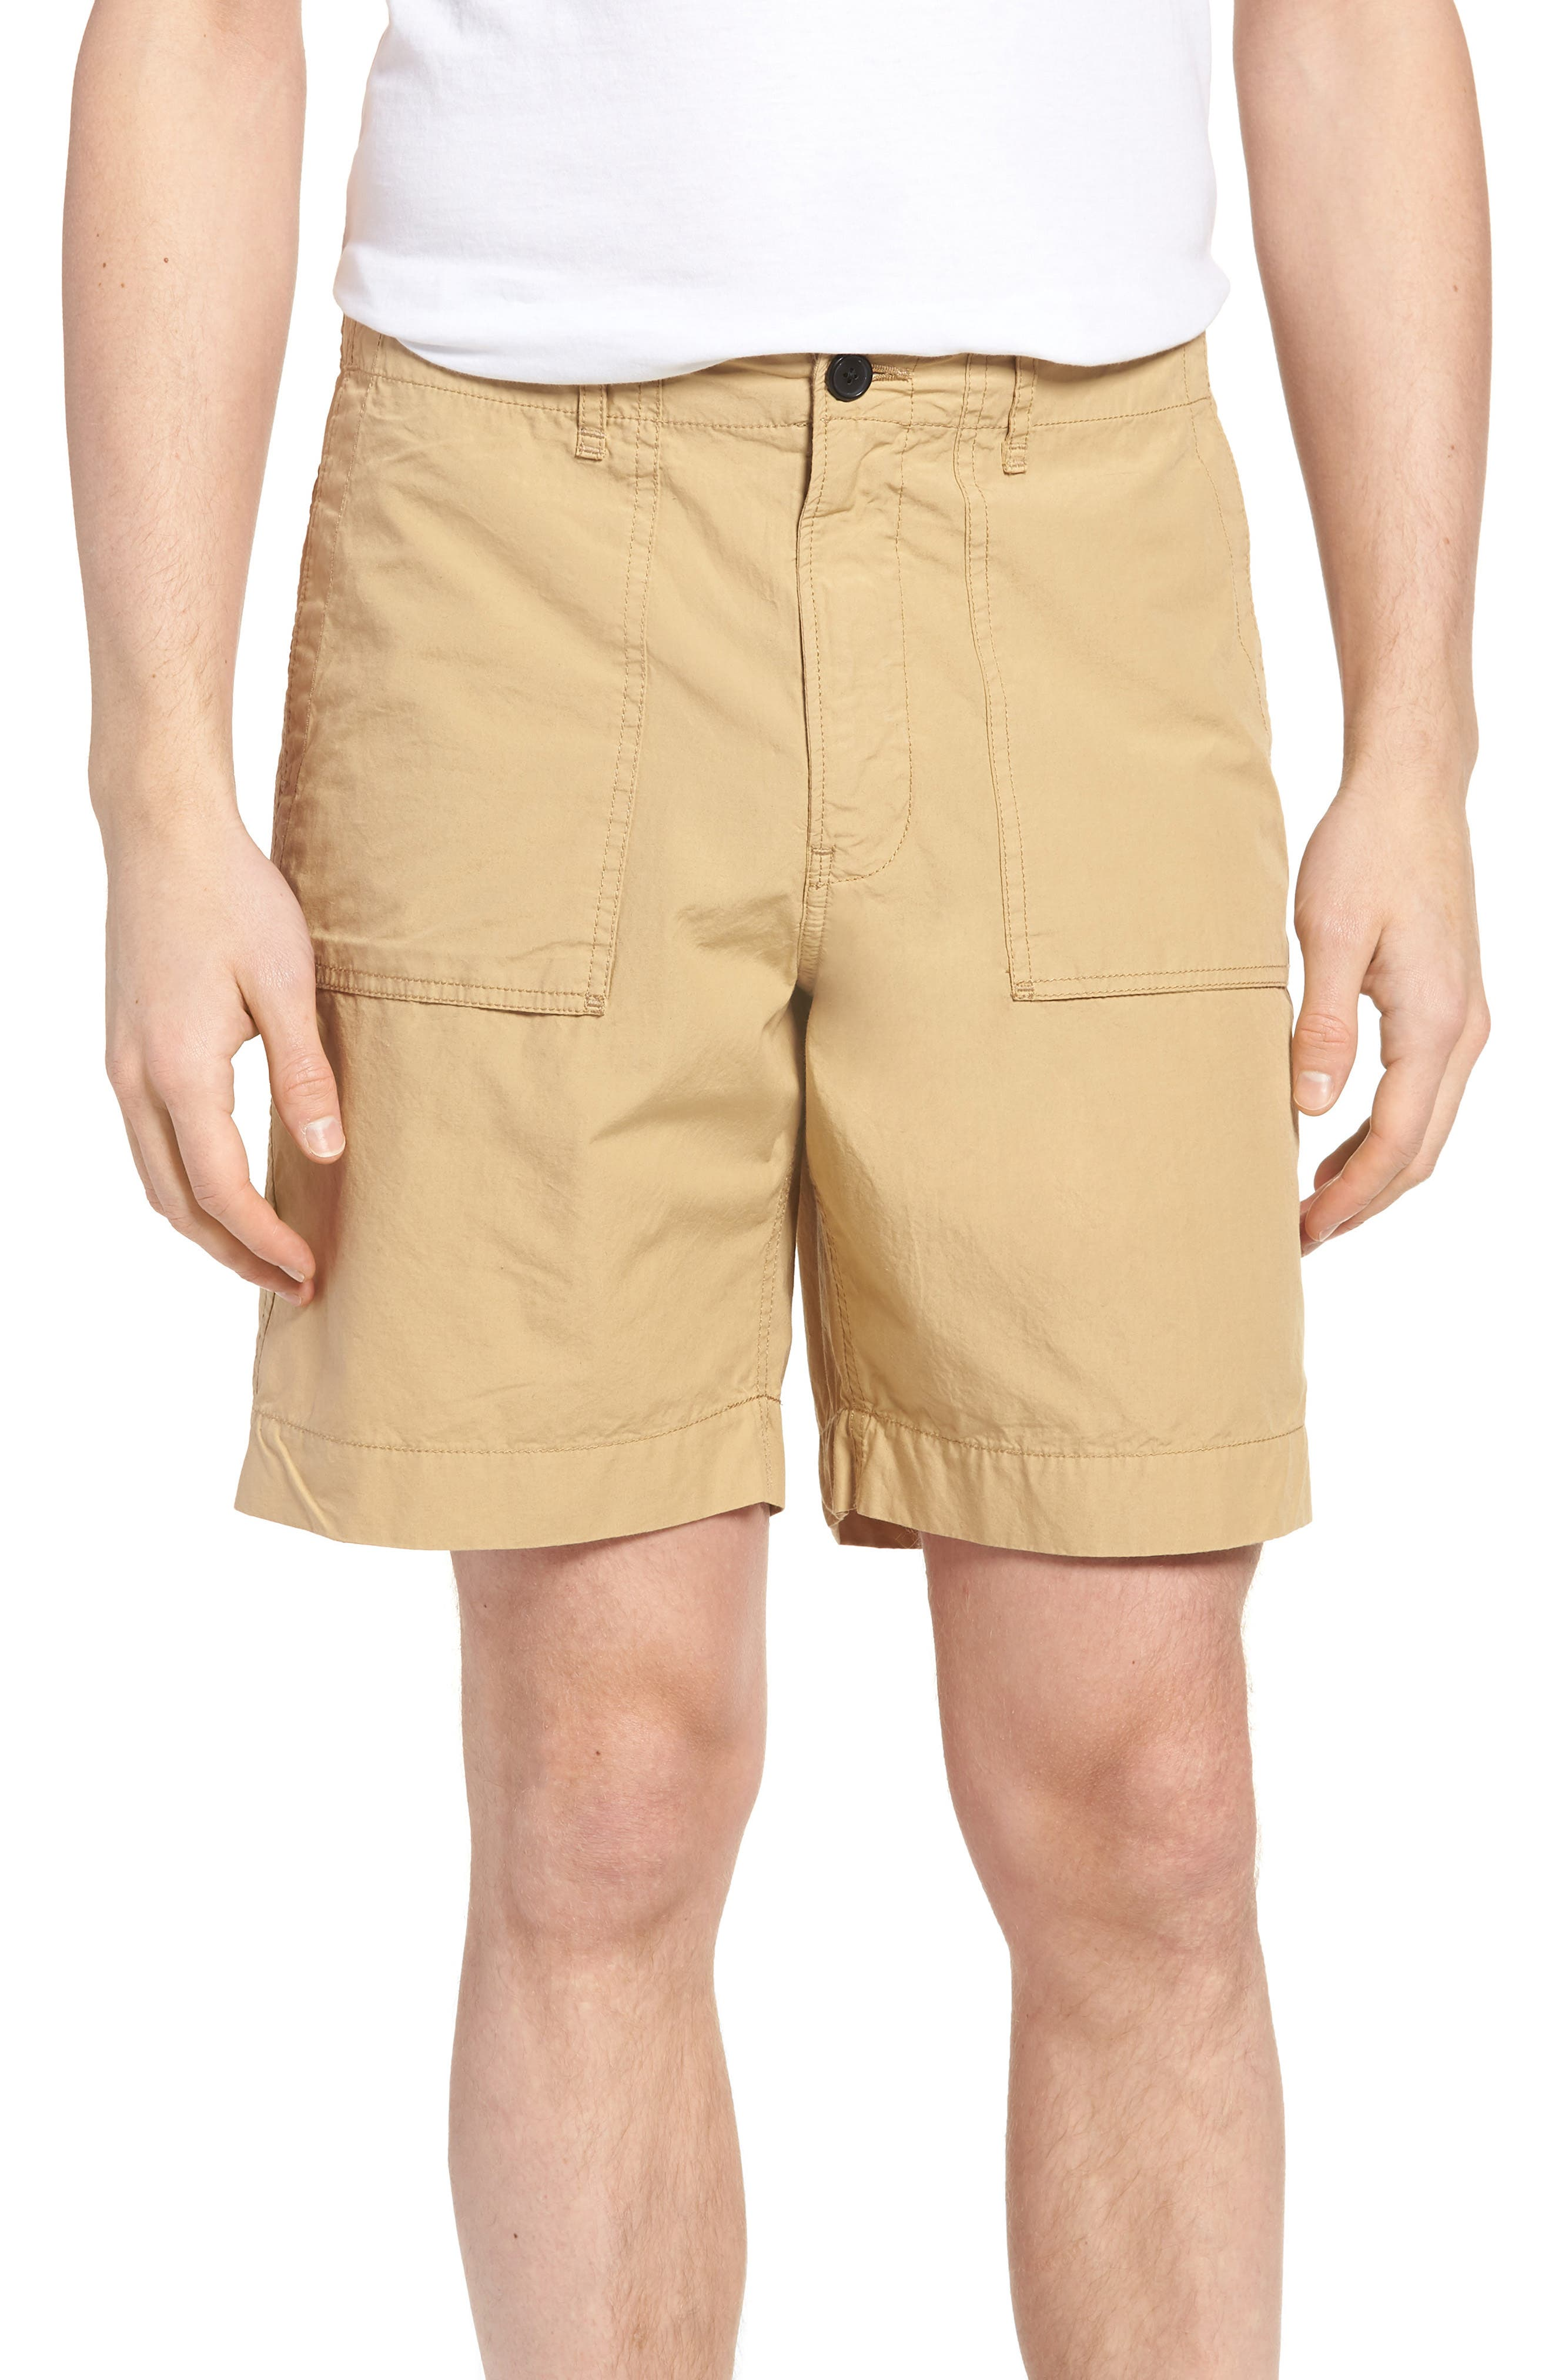 Everett Shorts,                         Main,                         color, 260